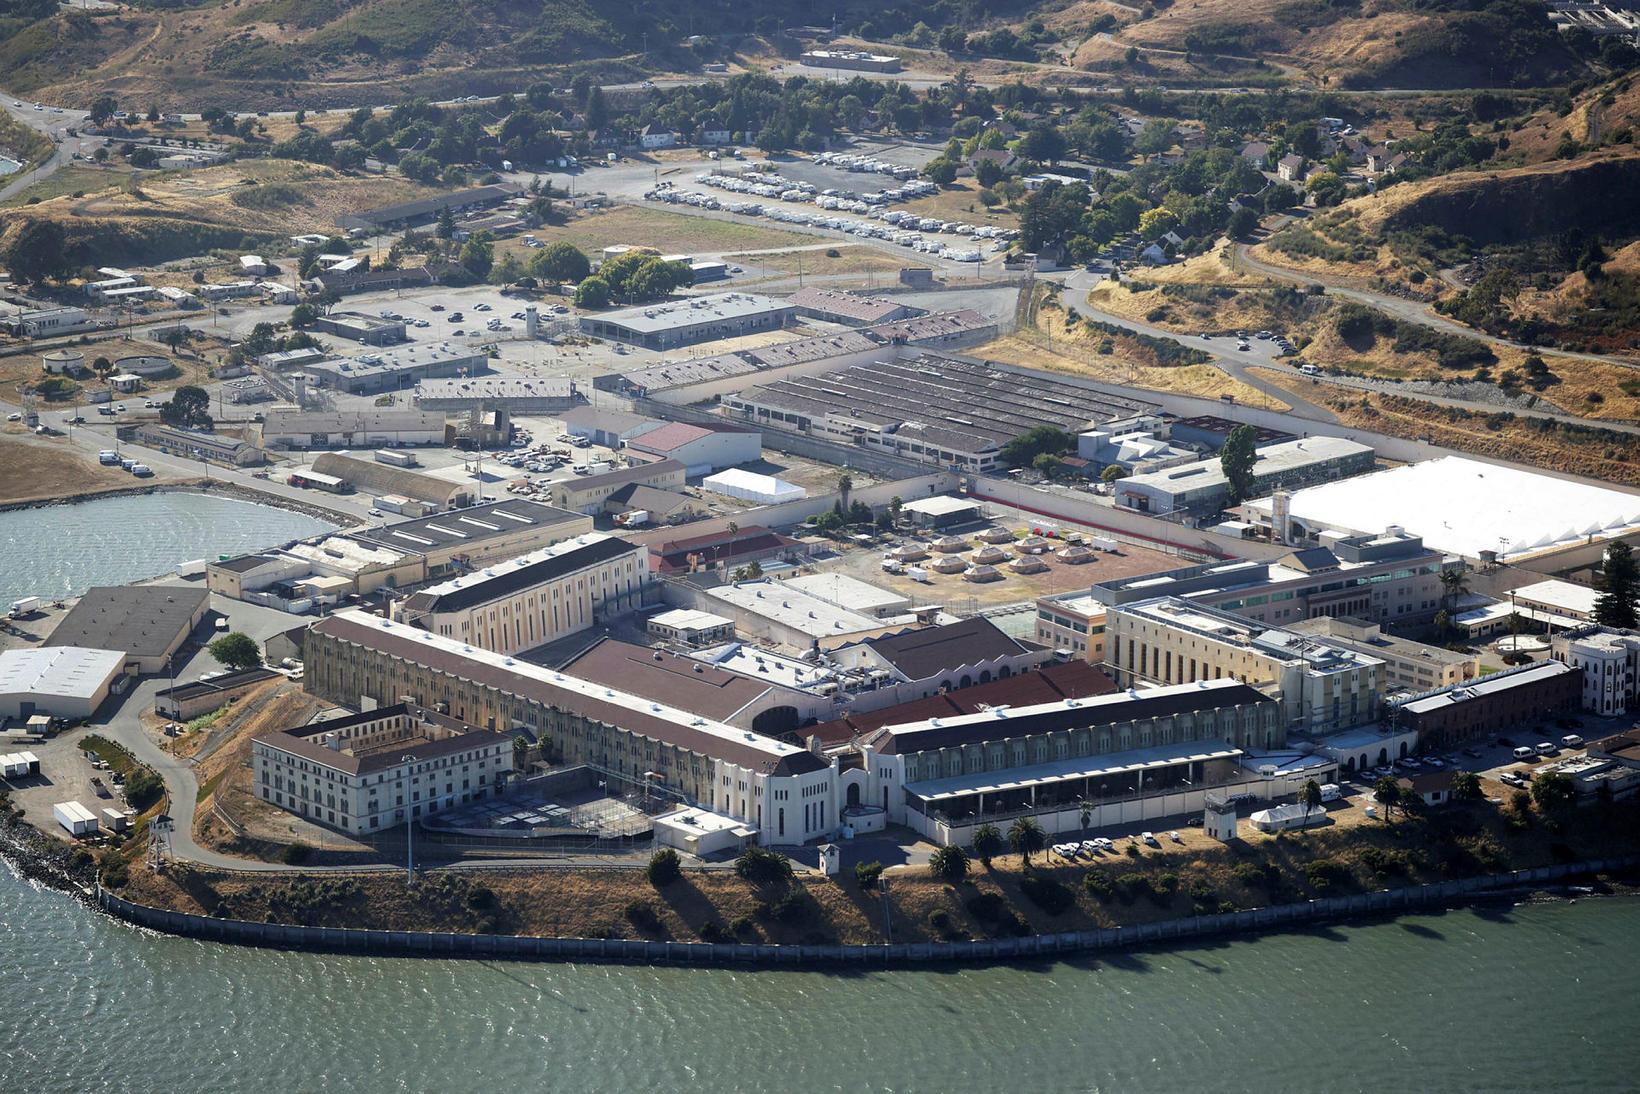 San Quentin fangelsið en yfir 1.400 fangar og starfsmenn hafa …